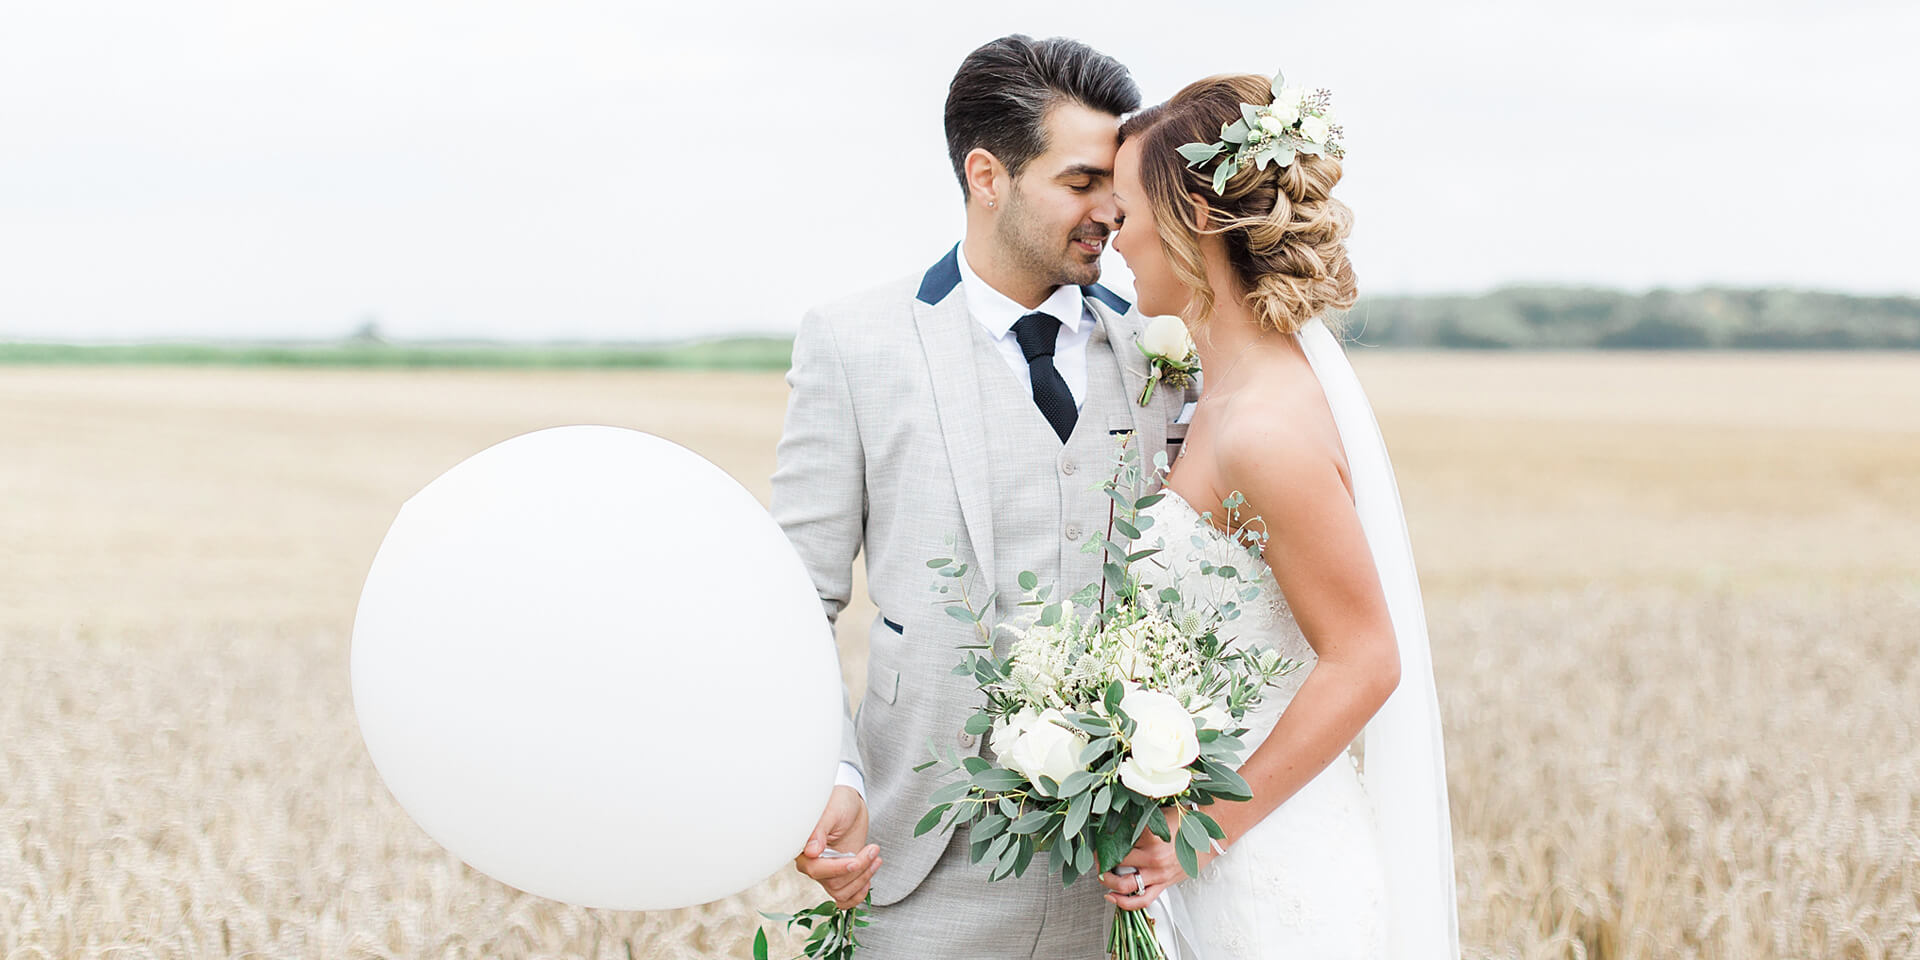 (c) Bassmeadmanorbarns-weddings.co.uk